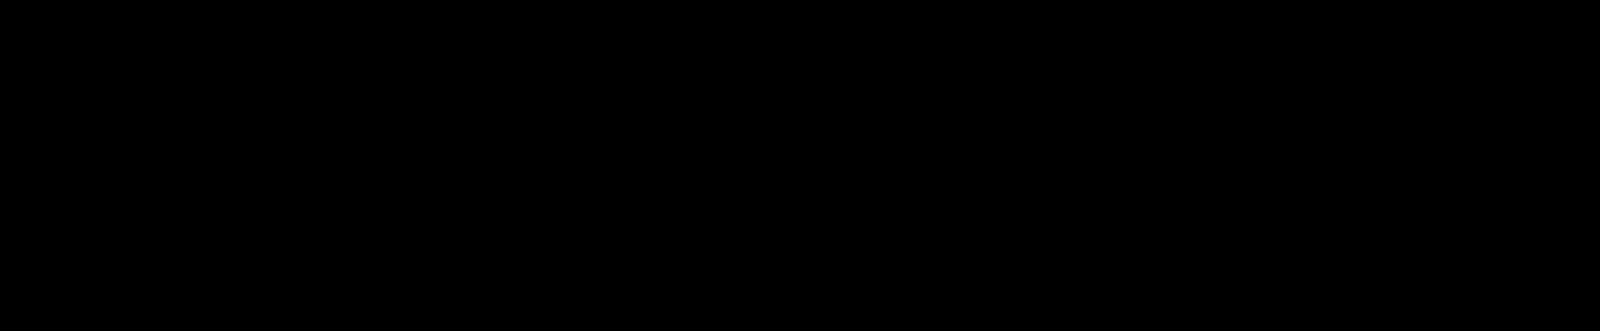 Alkanes, Alkenes, Alkynes - The Learning Point